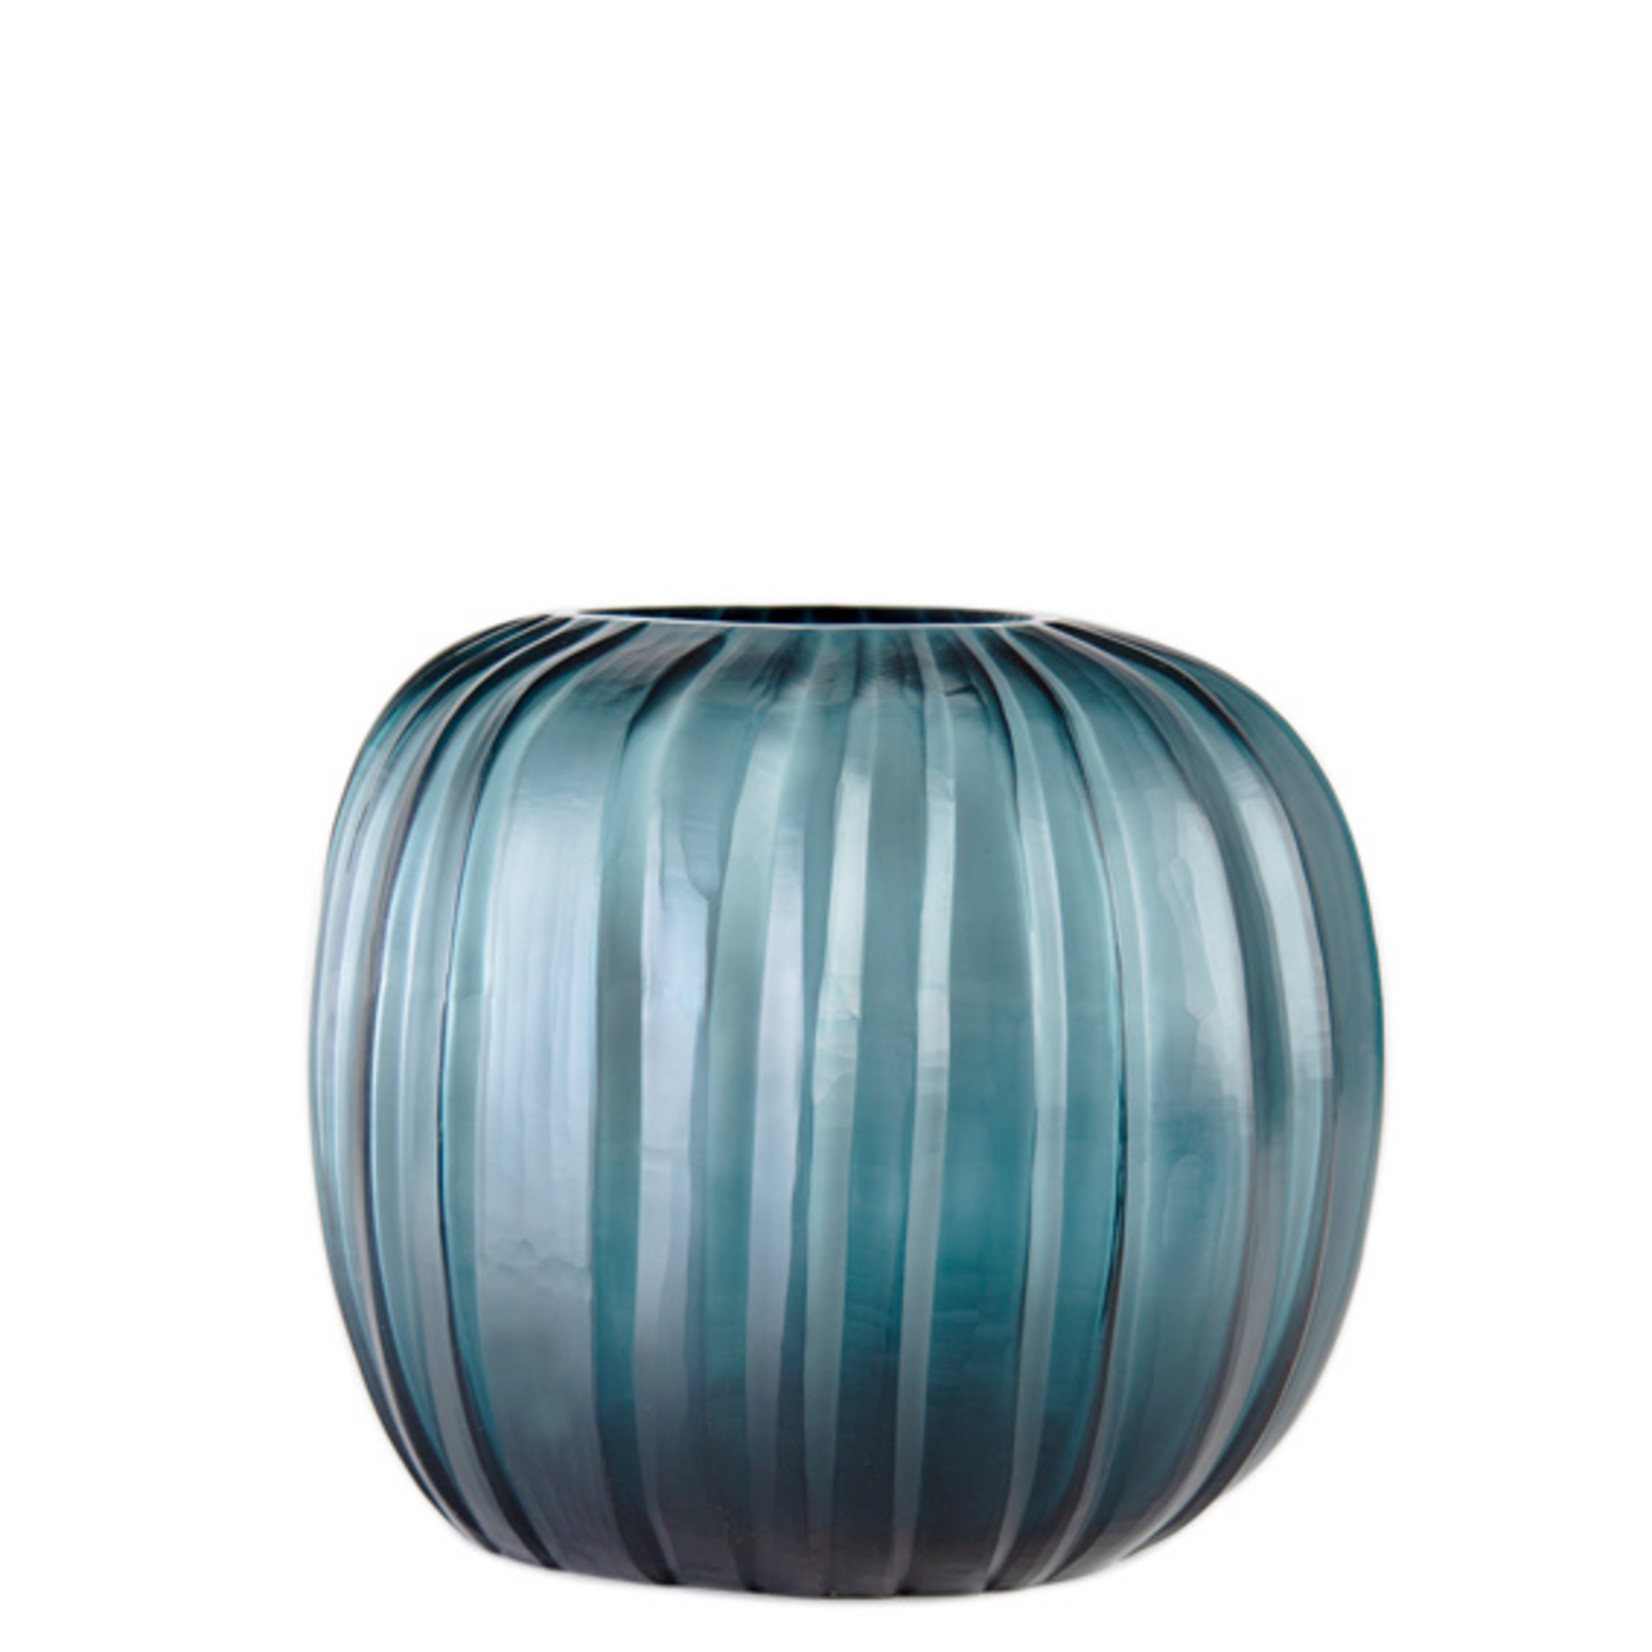 Guaxs Vase Manakara Round   Ocean Blue / Indigo